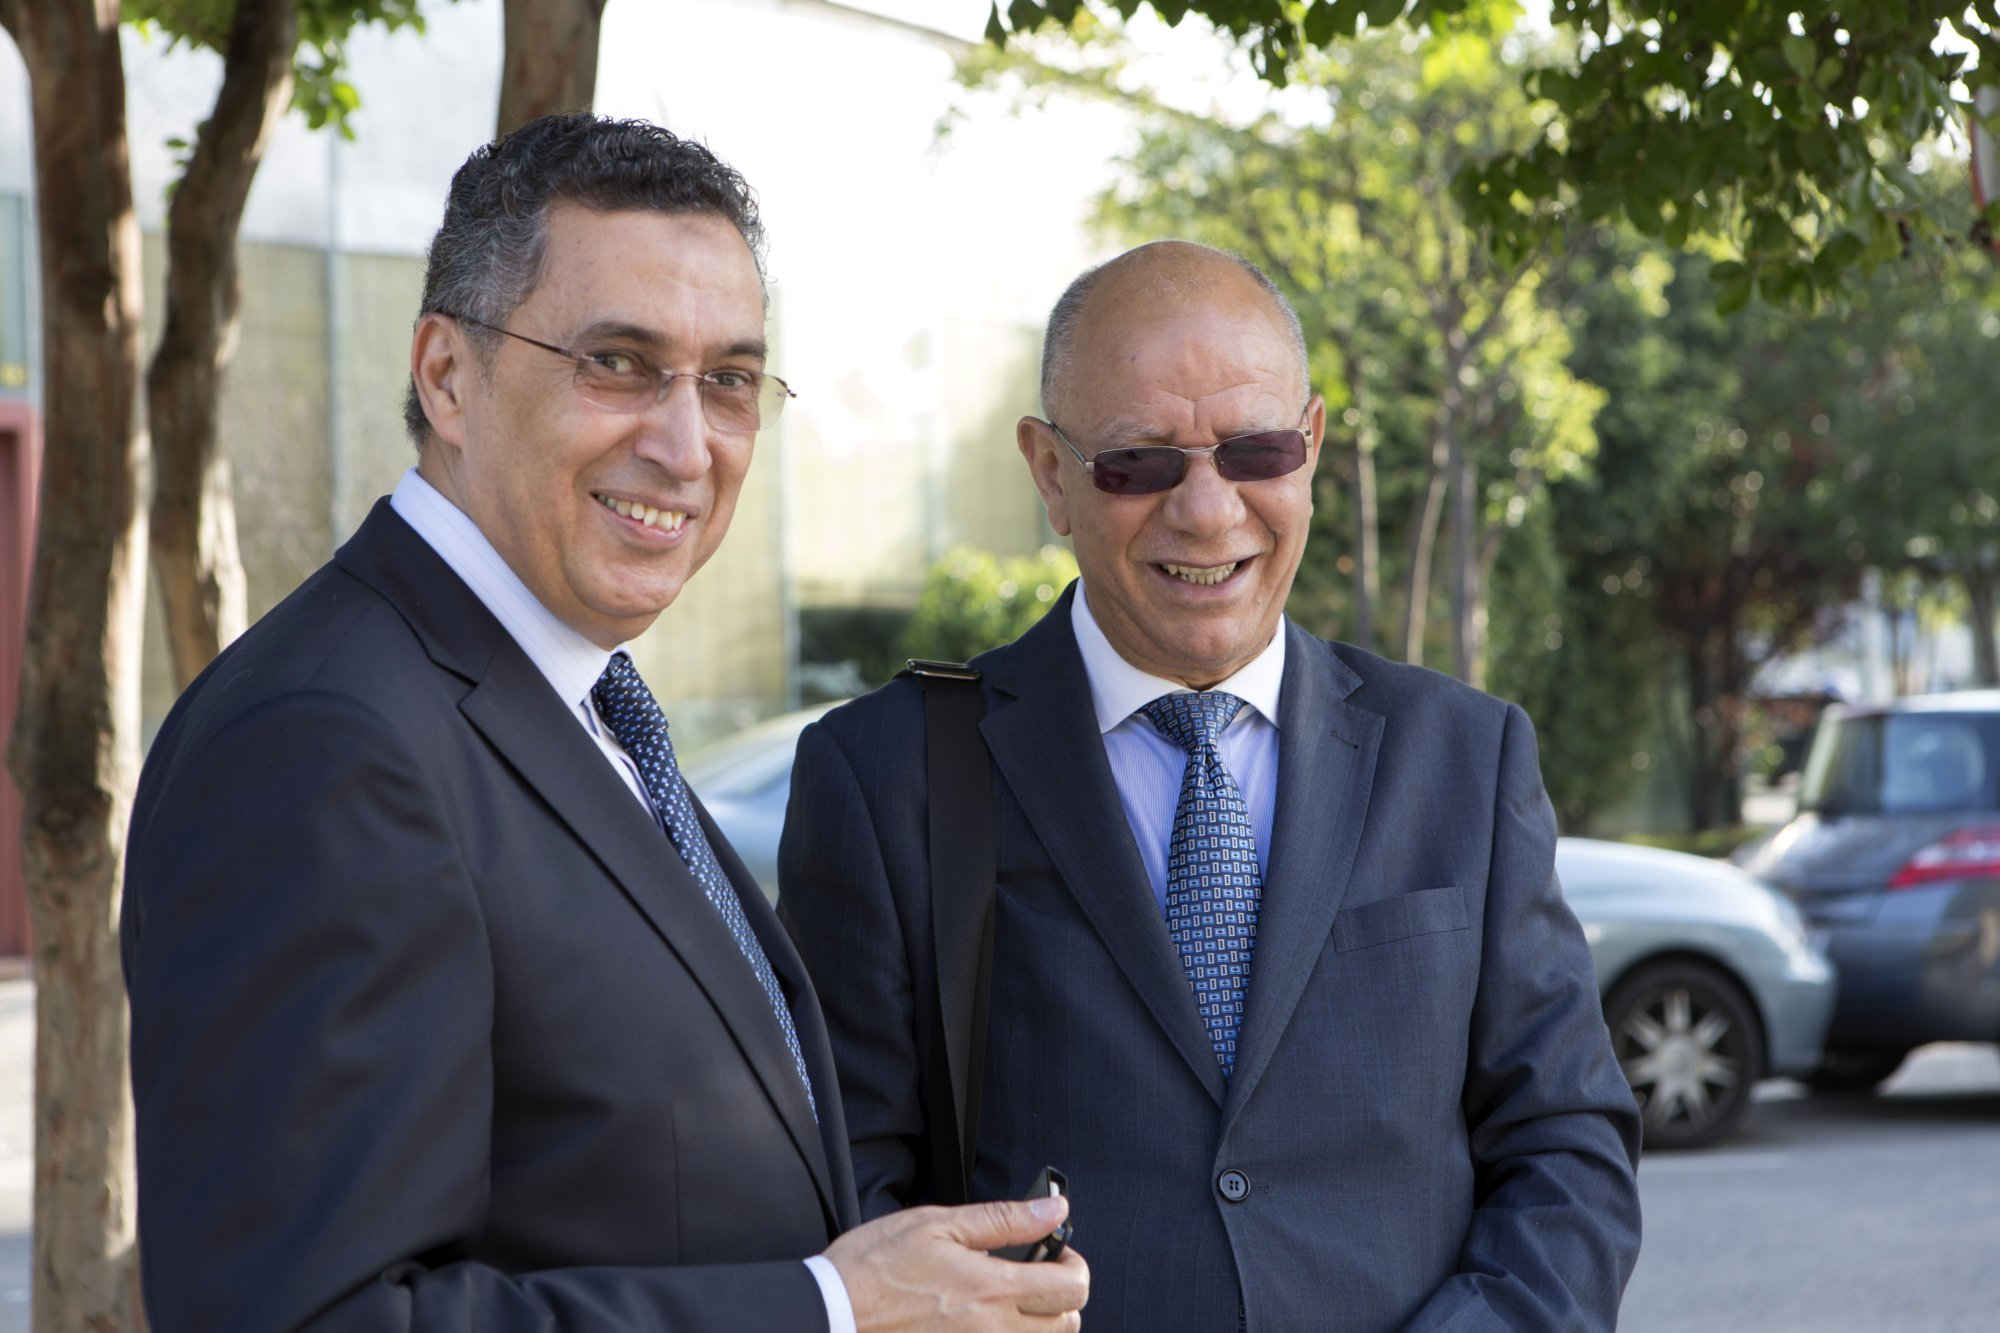 Eng. Anwar El Mezwaghi and Mr. Bouziane Ahmed Khodja from Islam Hoy